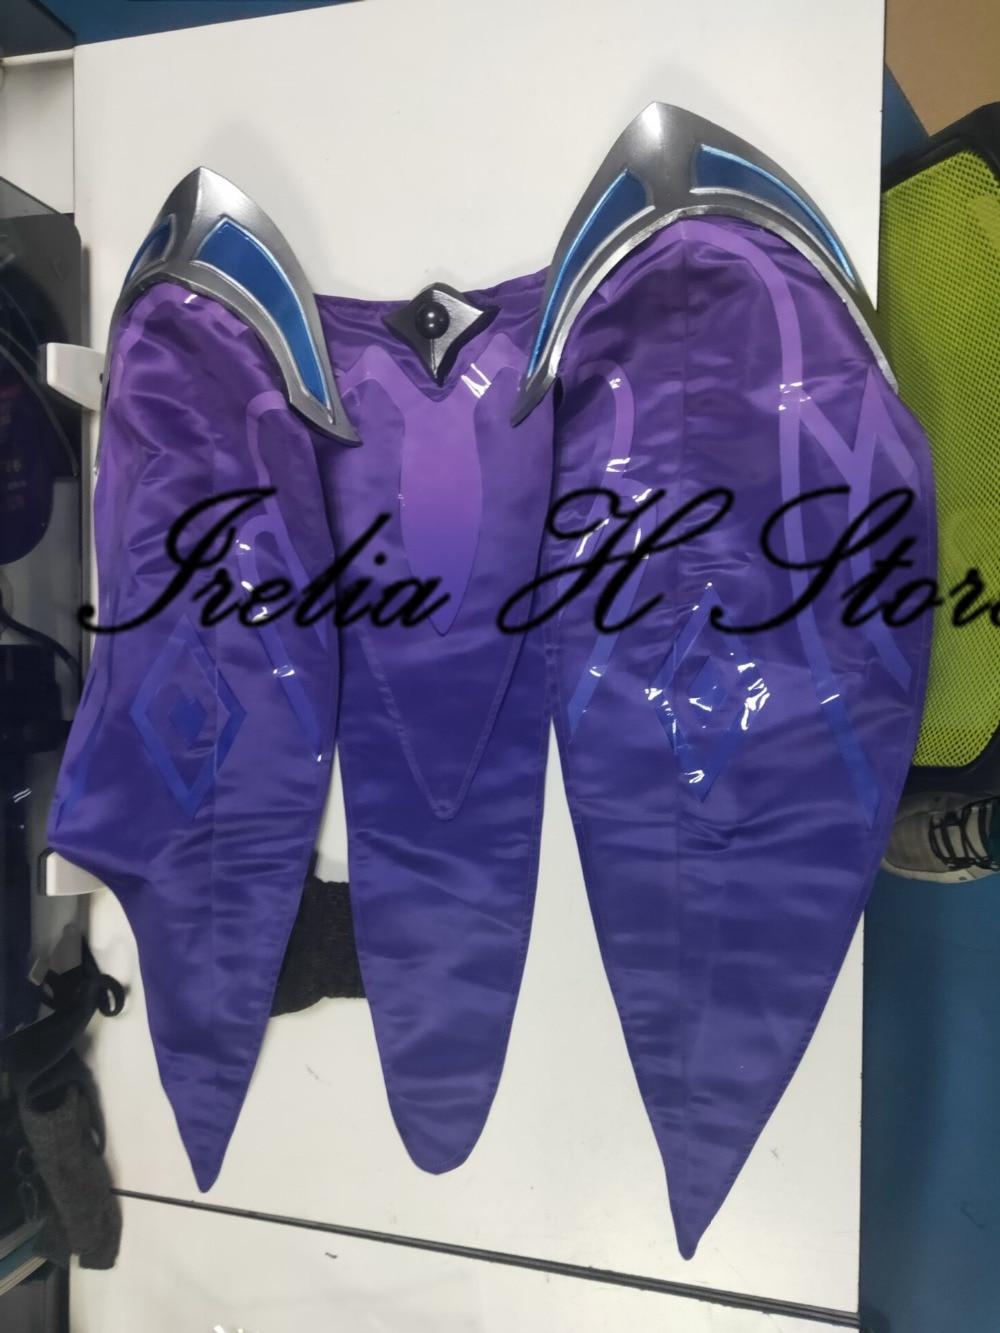 Angela Ziegler Atlantic Division Mercy All-star skin Cosplay Costume private custom made Full set 10